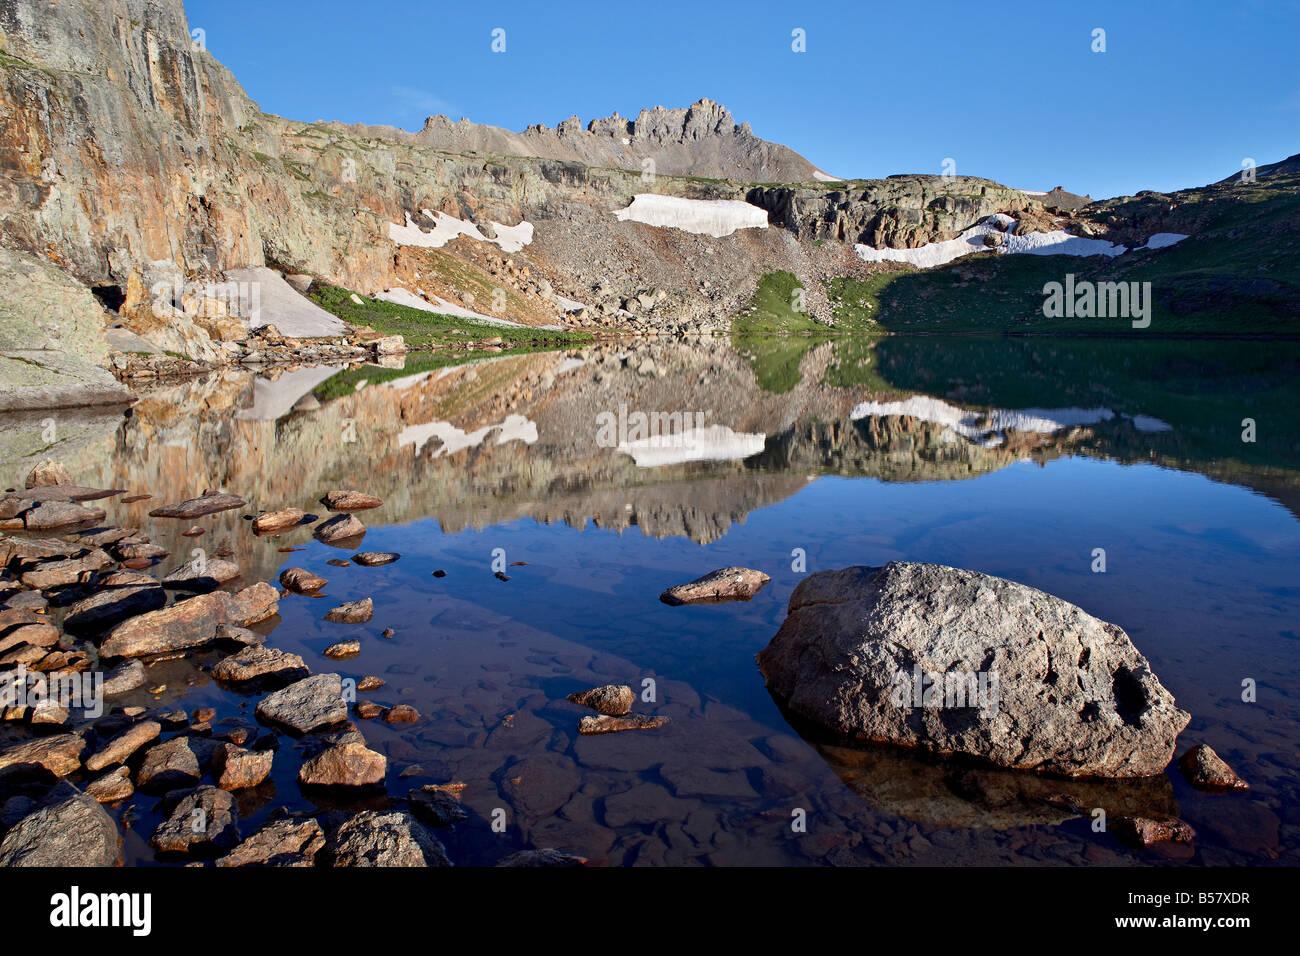 Bullion King Lake at dawn, Porphyry Basin, San Juan National Forest, Colorado, United States of America, North America - Stock Image